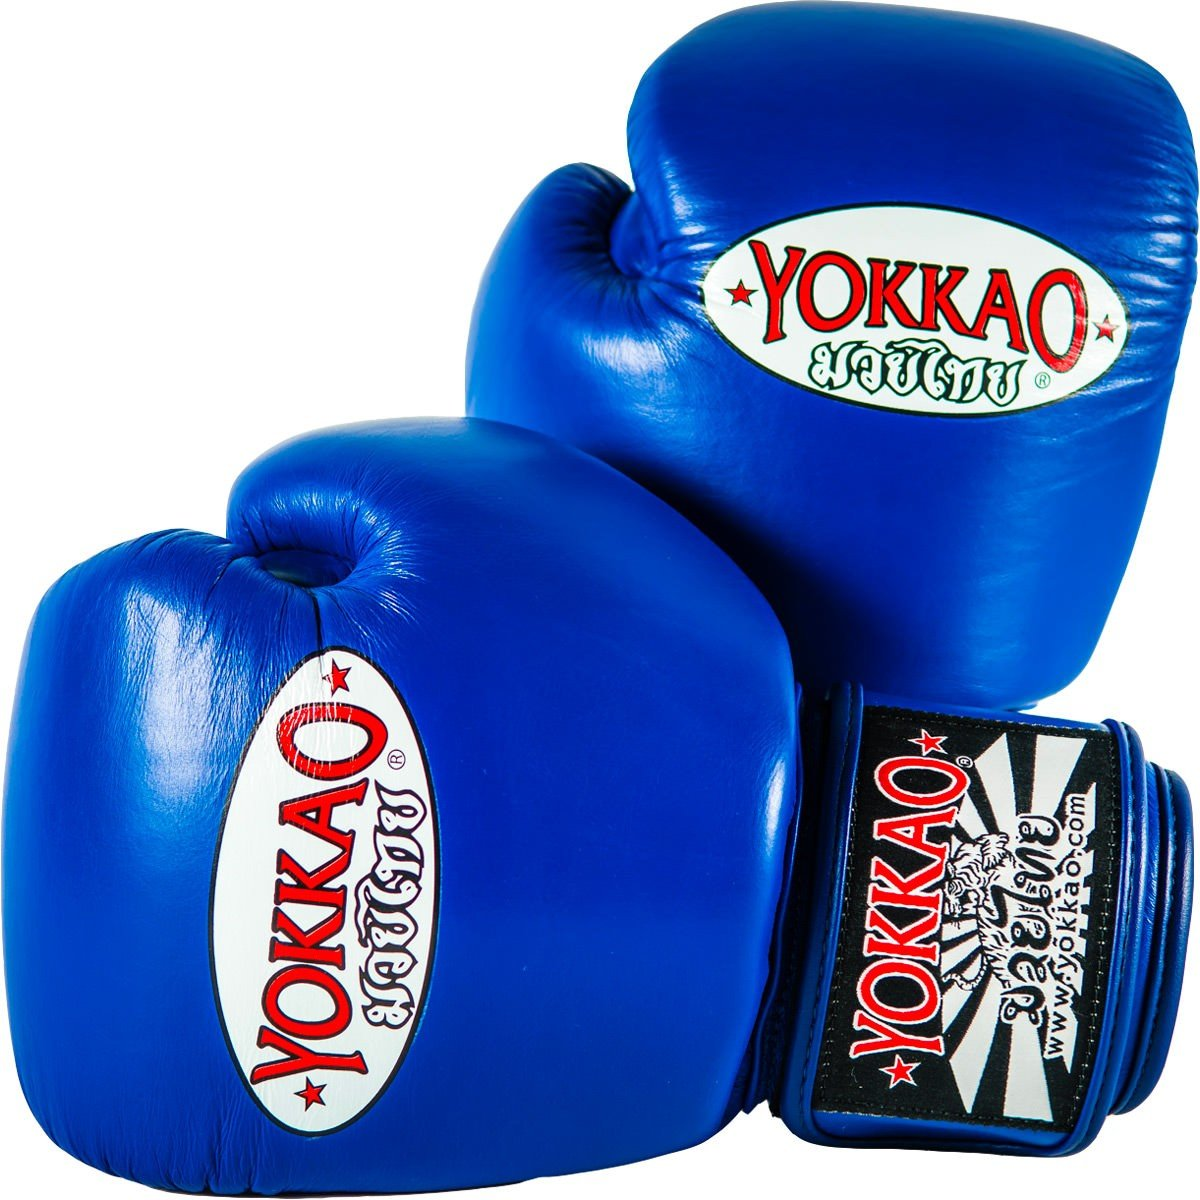 Yokkaoマトリックス通気性タイ式ボクシンググローブ – ブラック、レッド、ブルー、ホワイト、イエロー、グリーン、グレー、 ブルー 16 oz